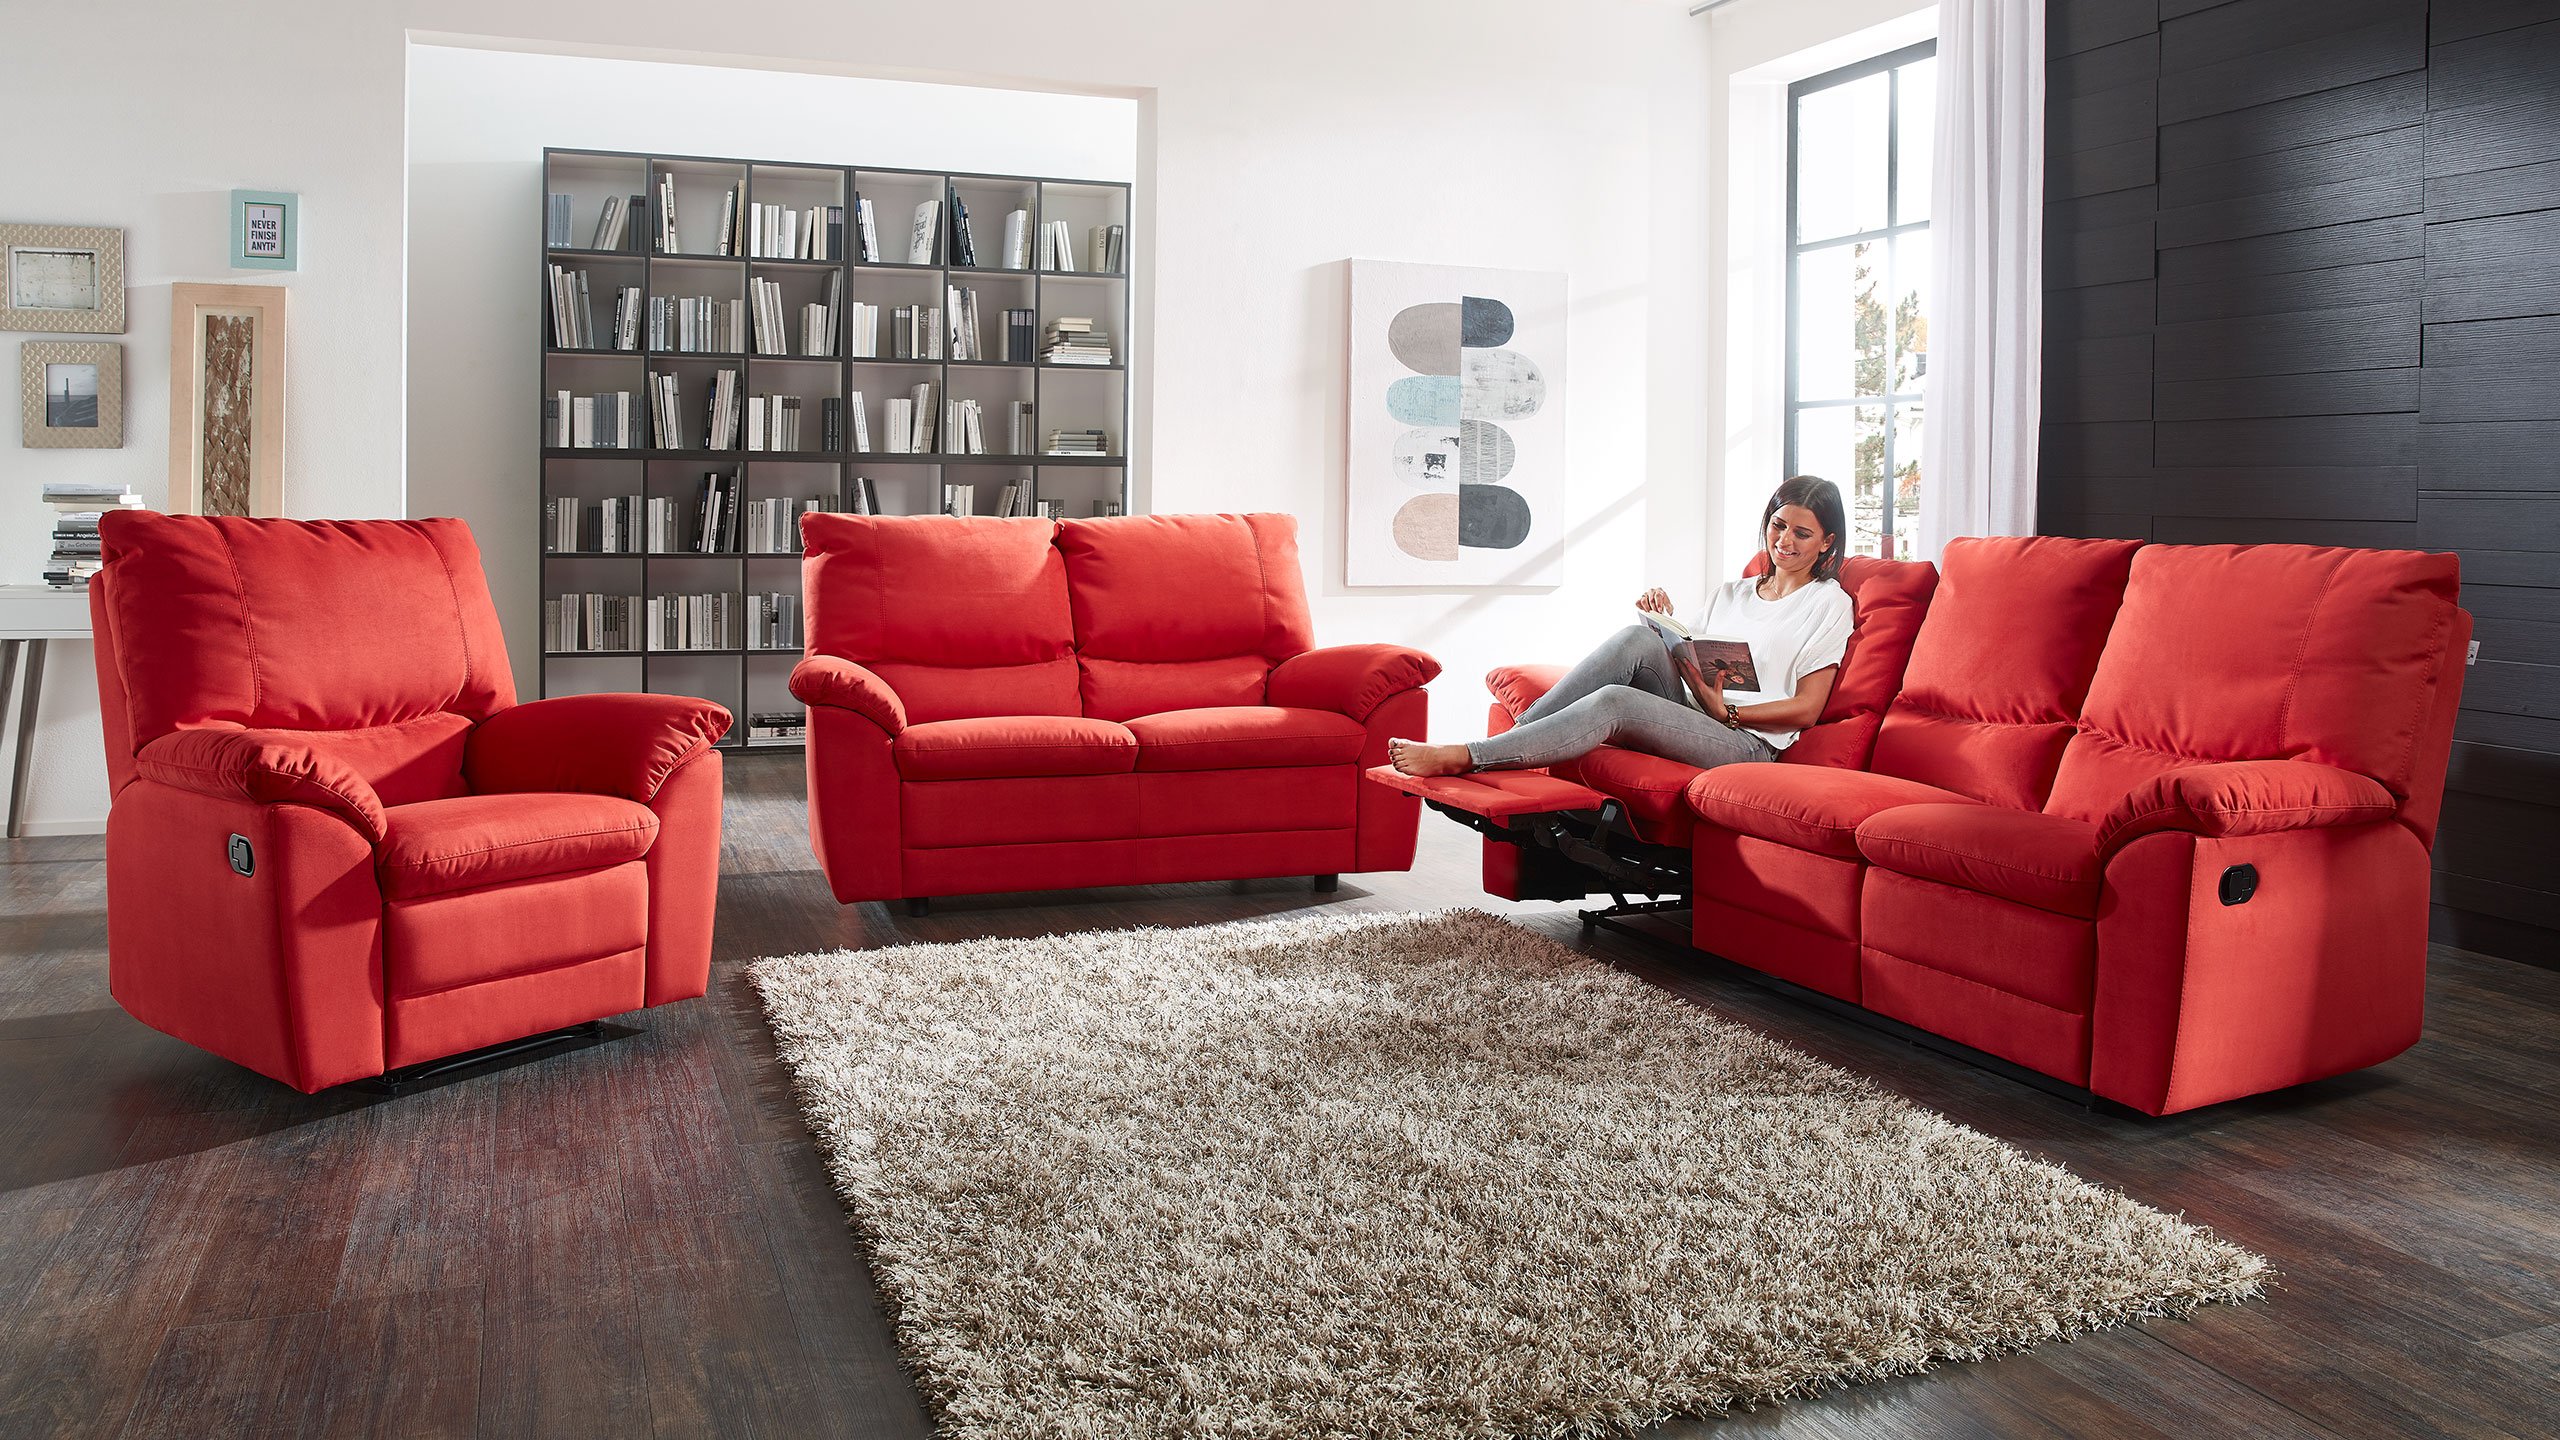 Marea Sofa Garnitur Stoff Rot